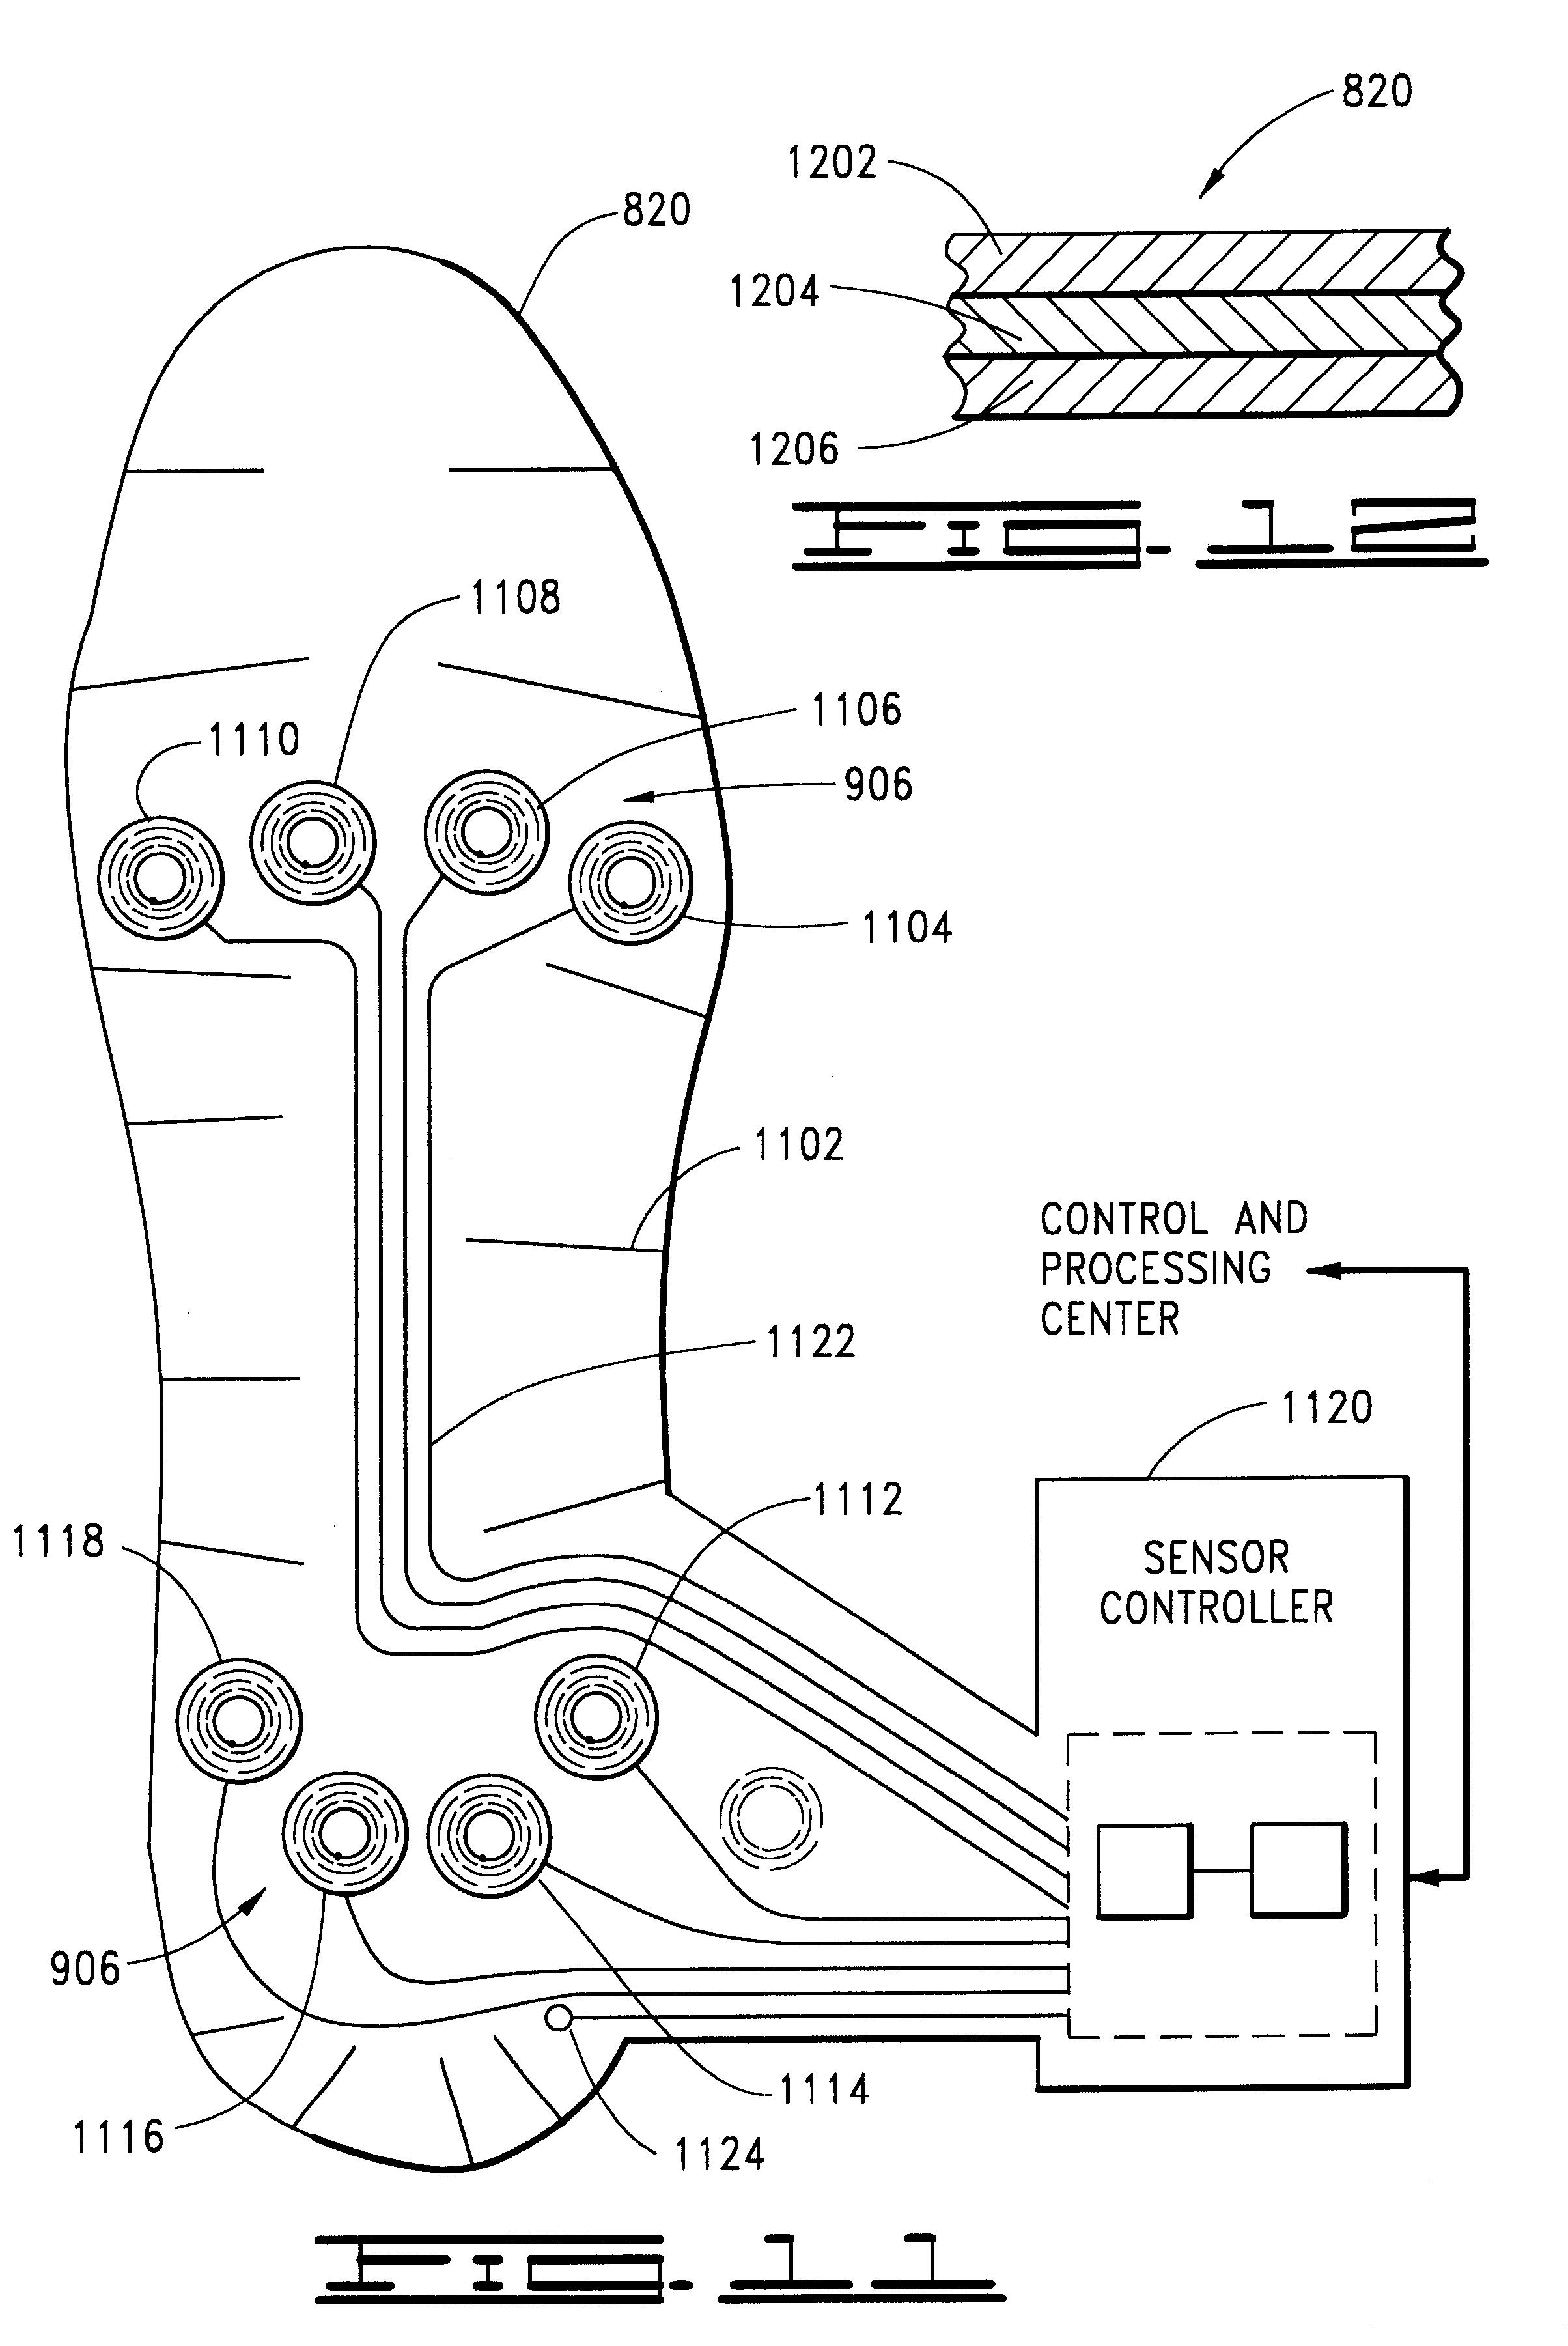 US06500210-20021231-D00005.png